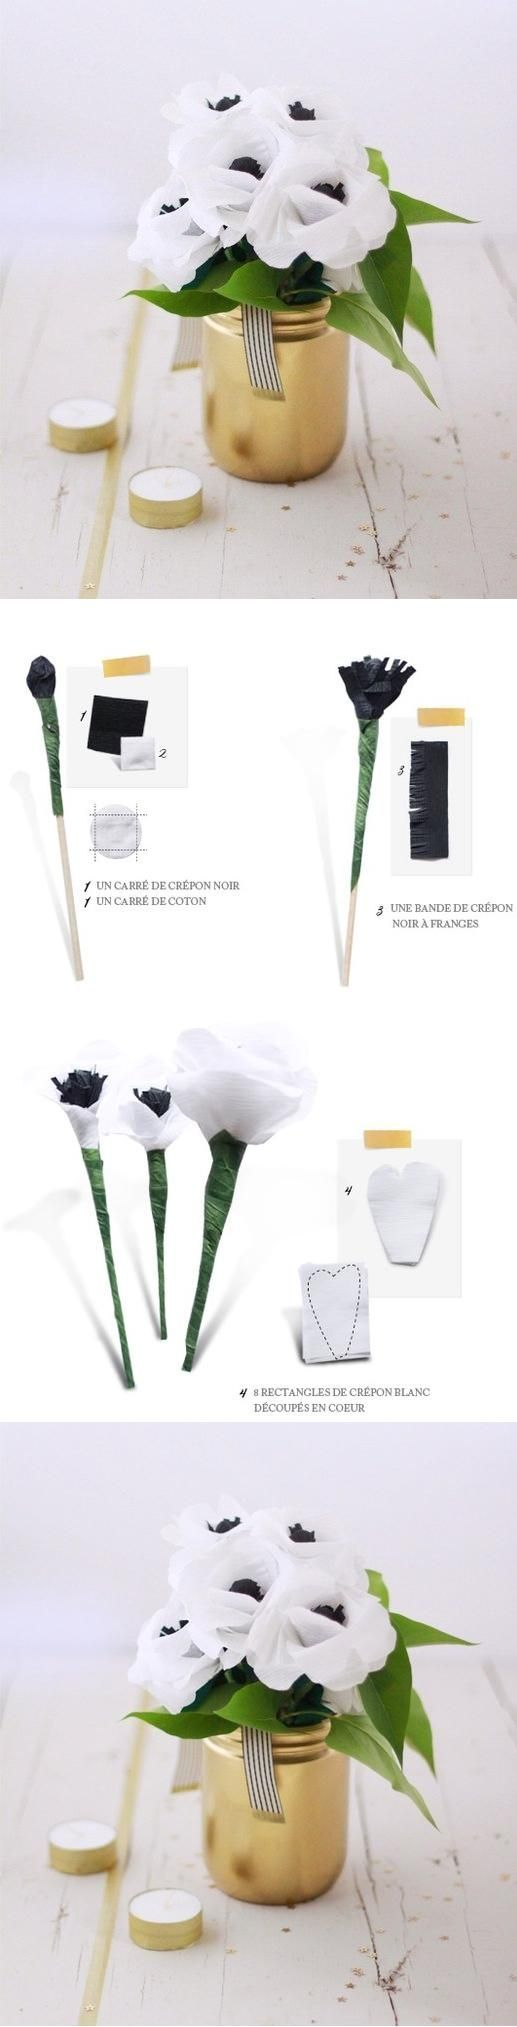 DIY Paper Flowers flowers diy crafts home made easy crafts craft idea crafts ideas diy ideas diy crafts diy idea do it yourself diy projects diy decor diy craft decorations